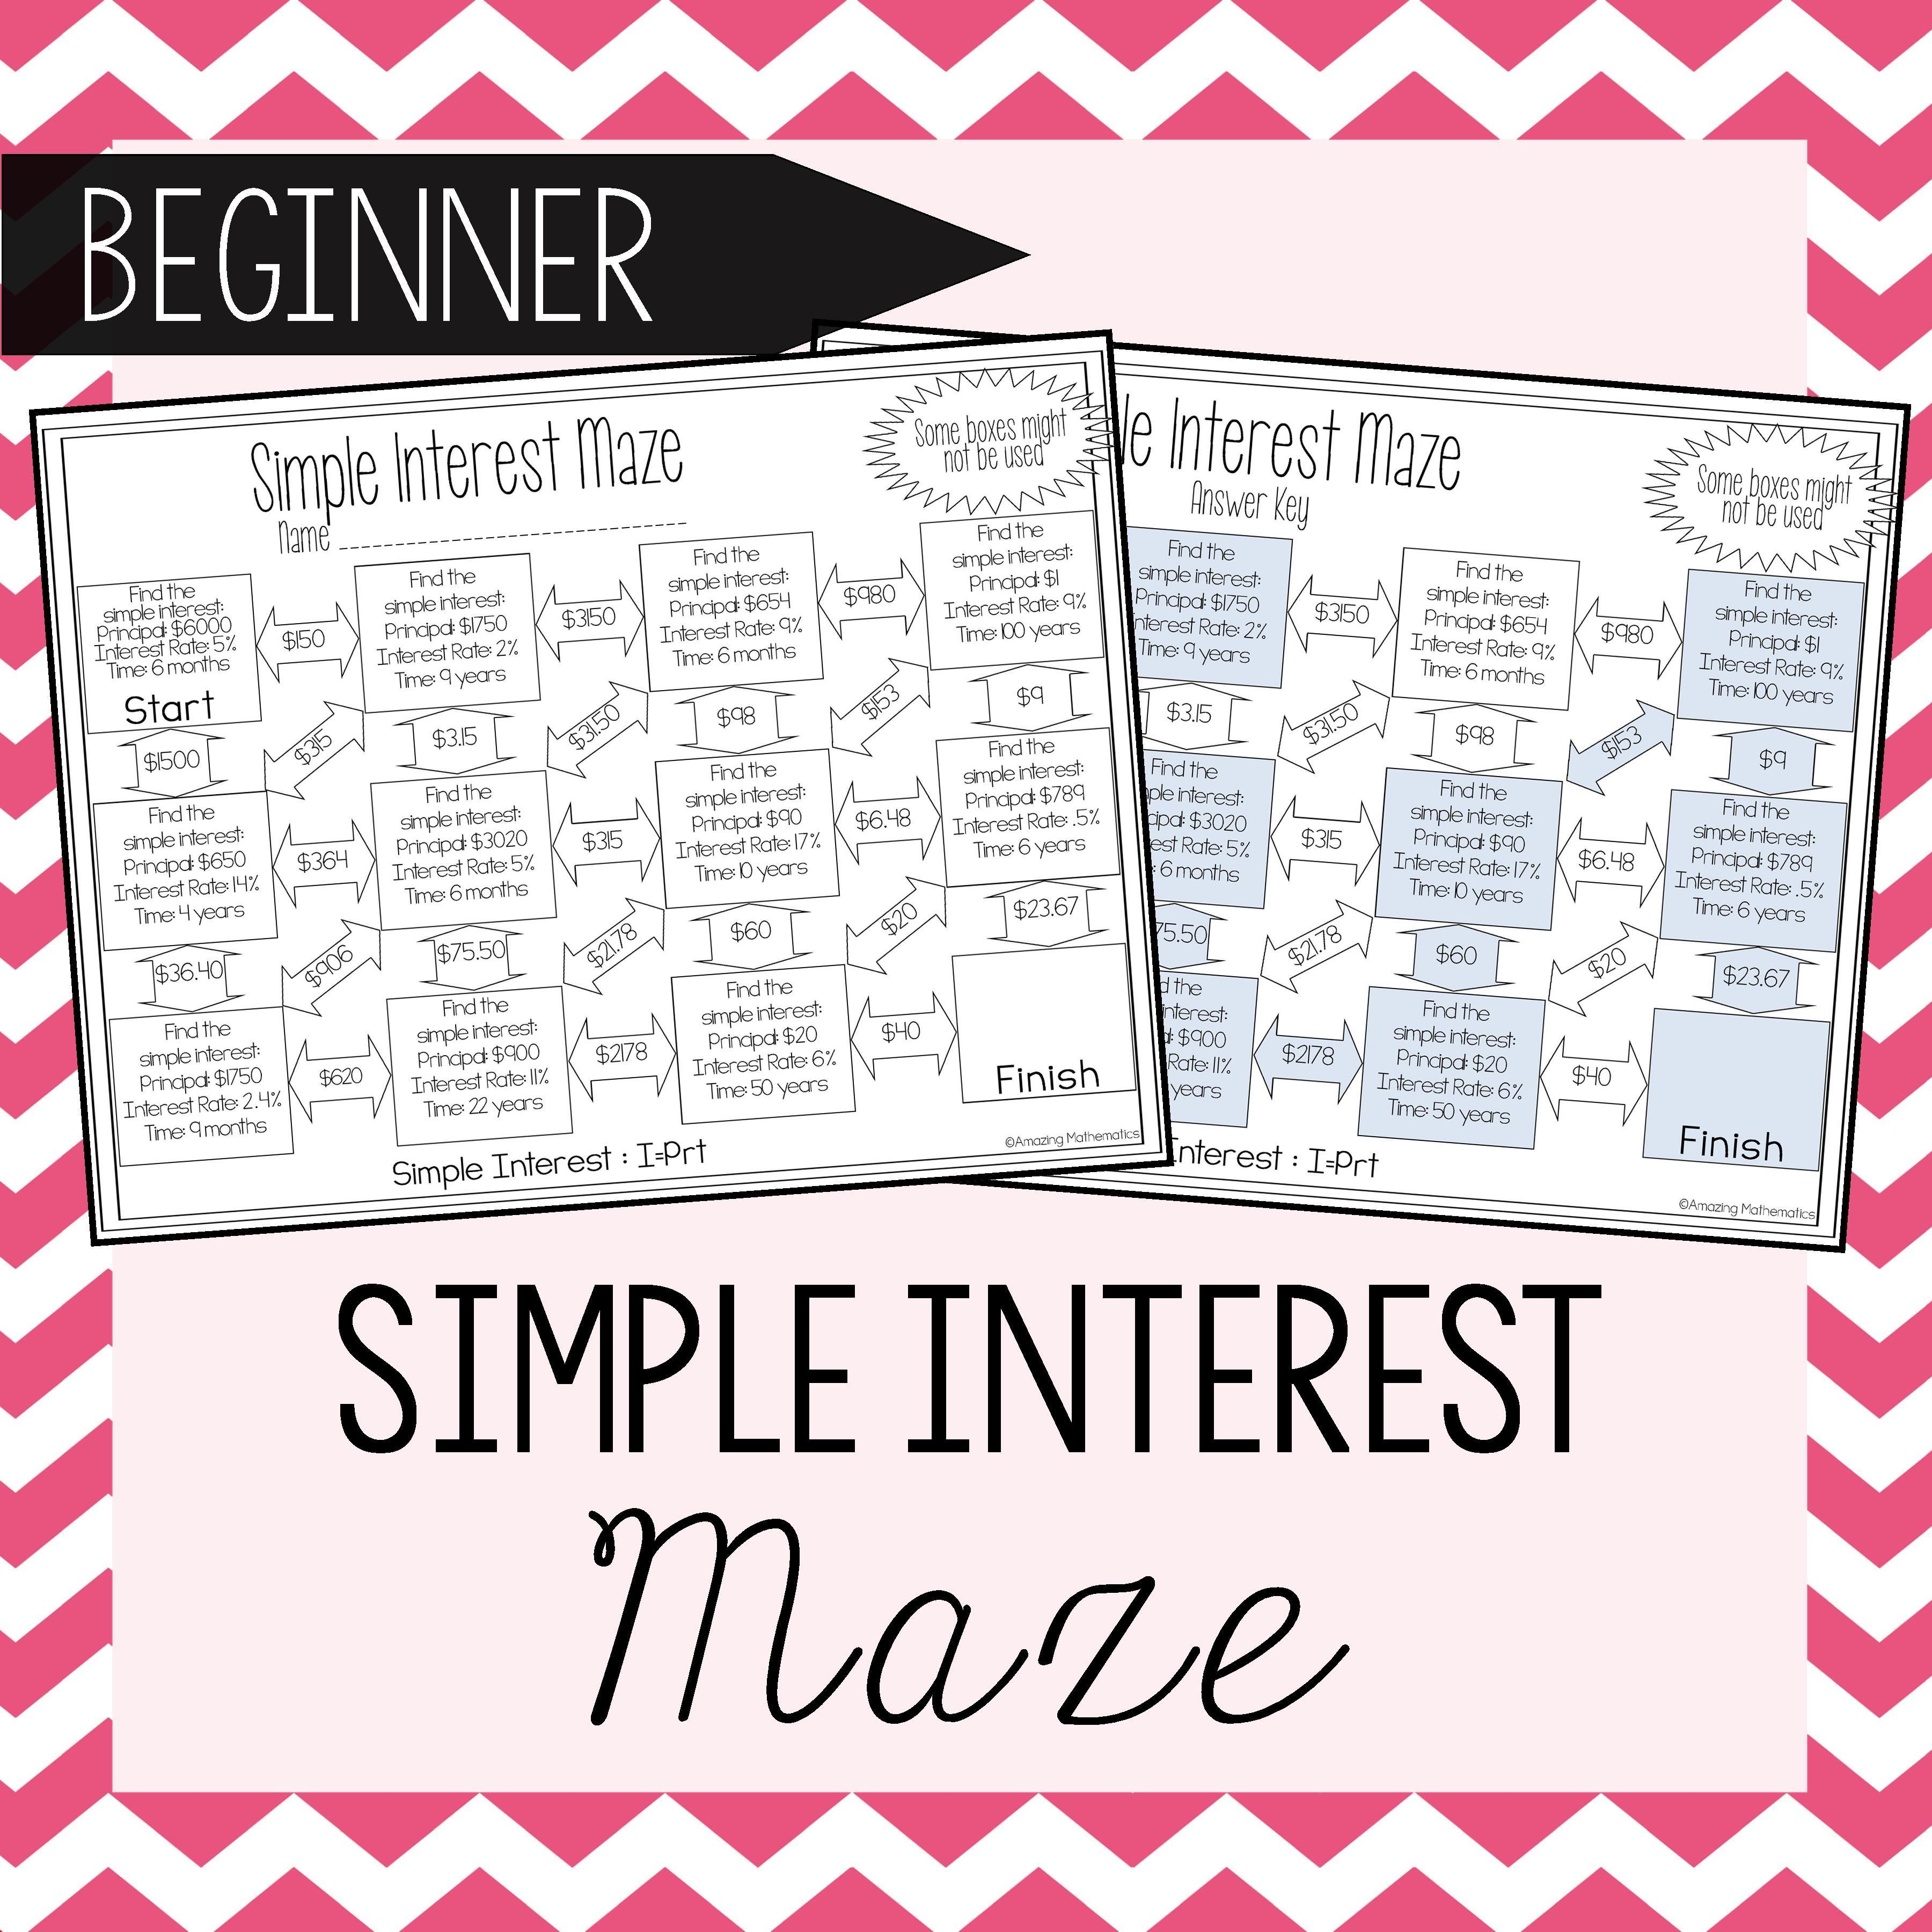 Simple Interest Maze Beginner